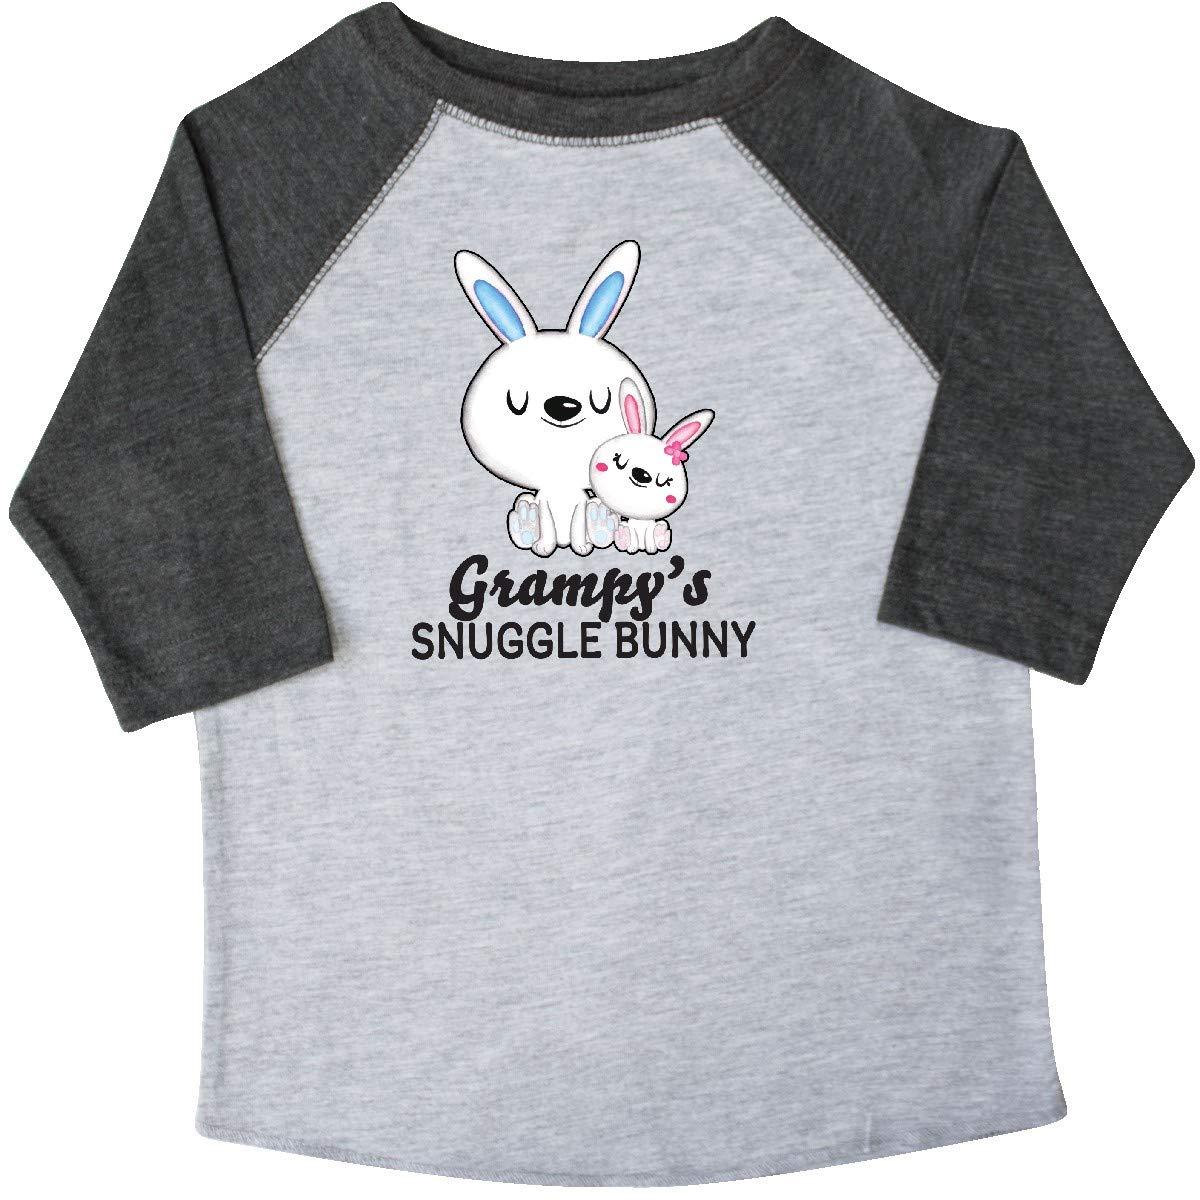 inktastic Grampys Snuggle Bunny Easter Toddler T-Shirt